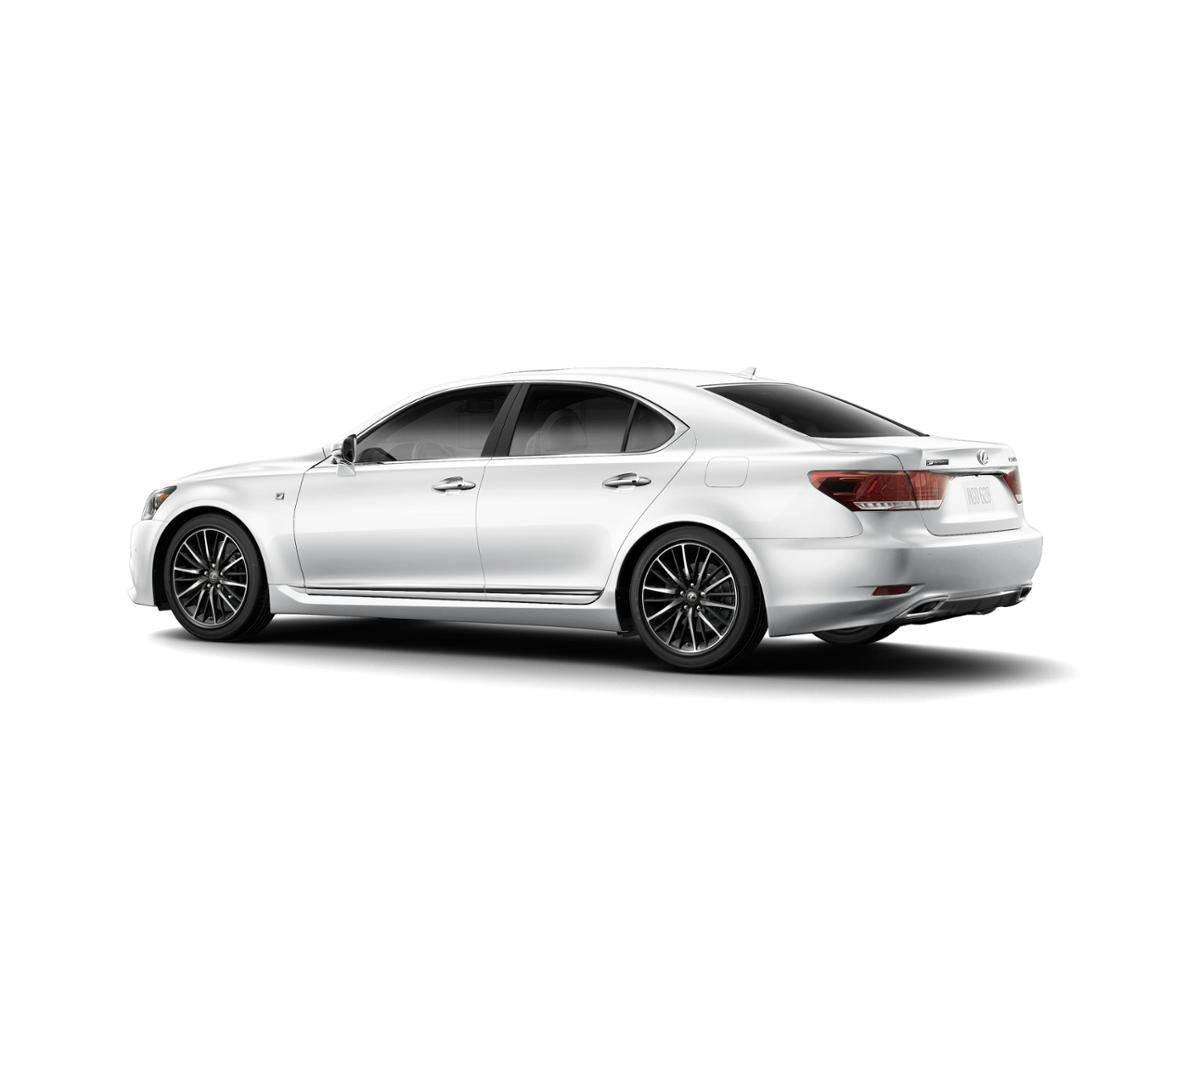 2013 Lexus Ls460 For Sale: Dallas Certified 2017 Lexus LS 460 Ultra White: Car For